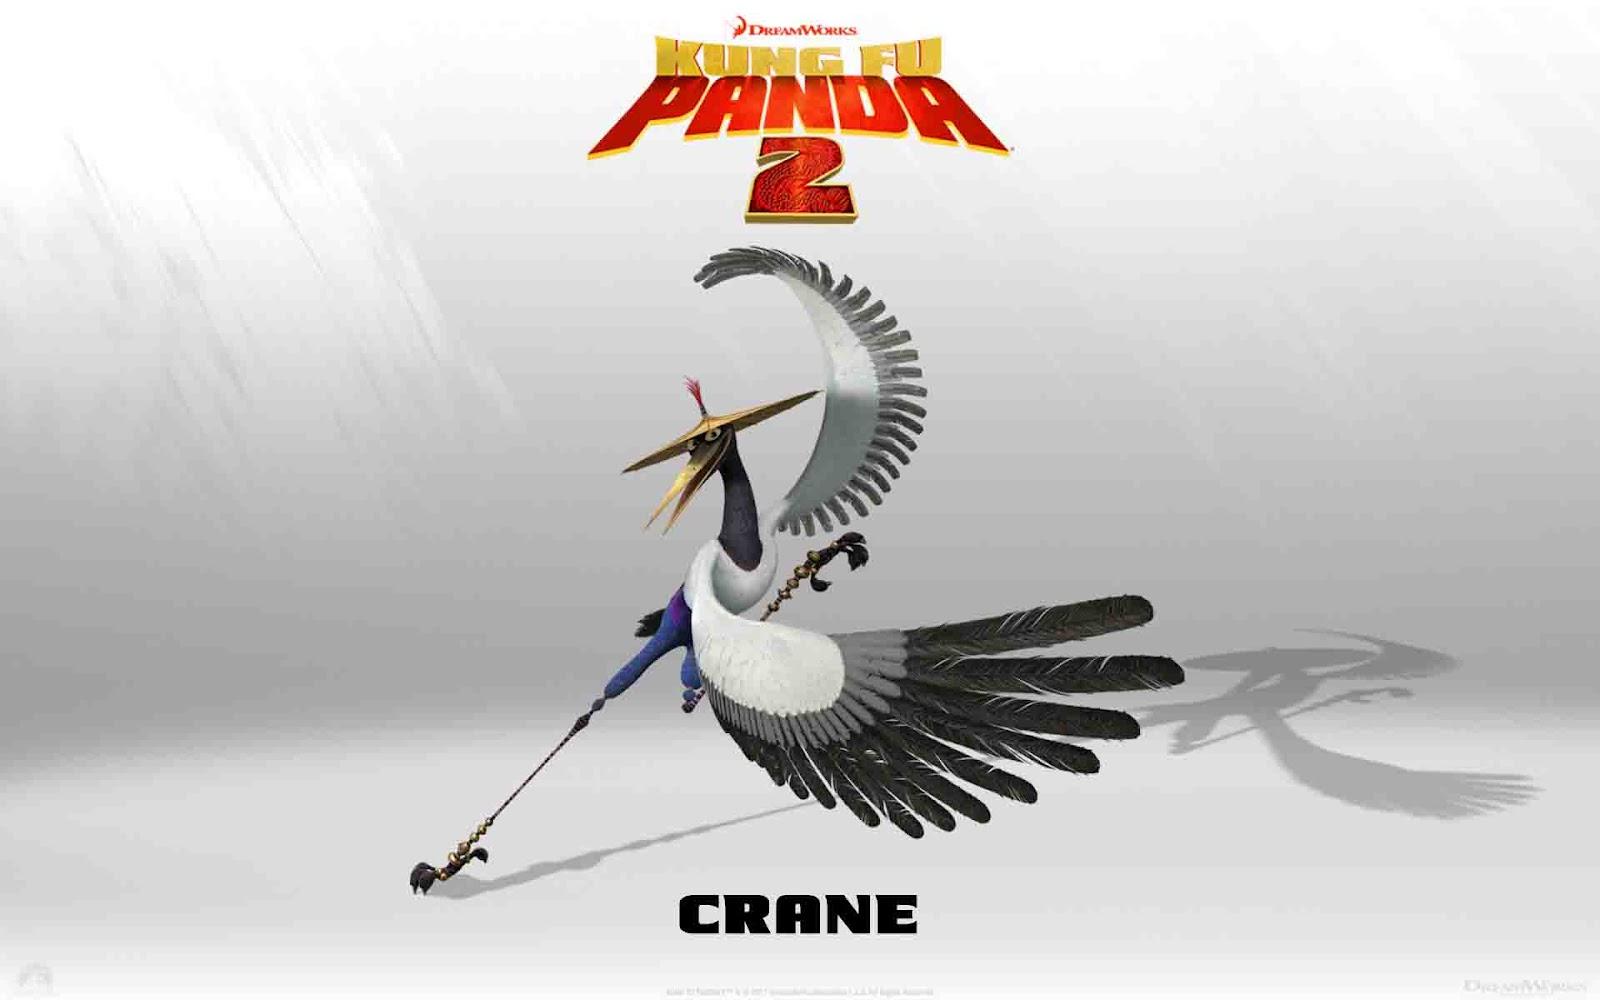 http://4.bp.blogspot.com/-cSUWGpWLjvw/T02pIlAbttI/AAAAAAAAAhc/J94ft5shR0s/s1600/kung-fu-panda-2-crane.jpg